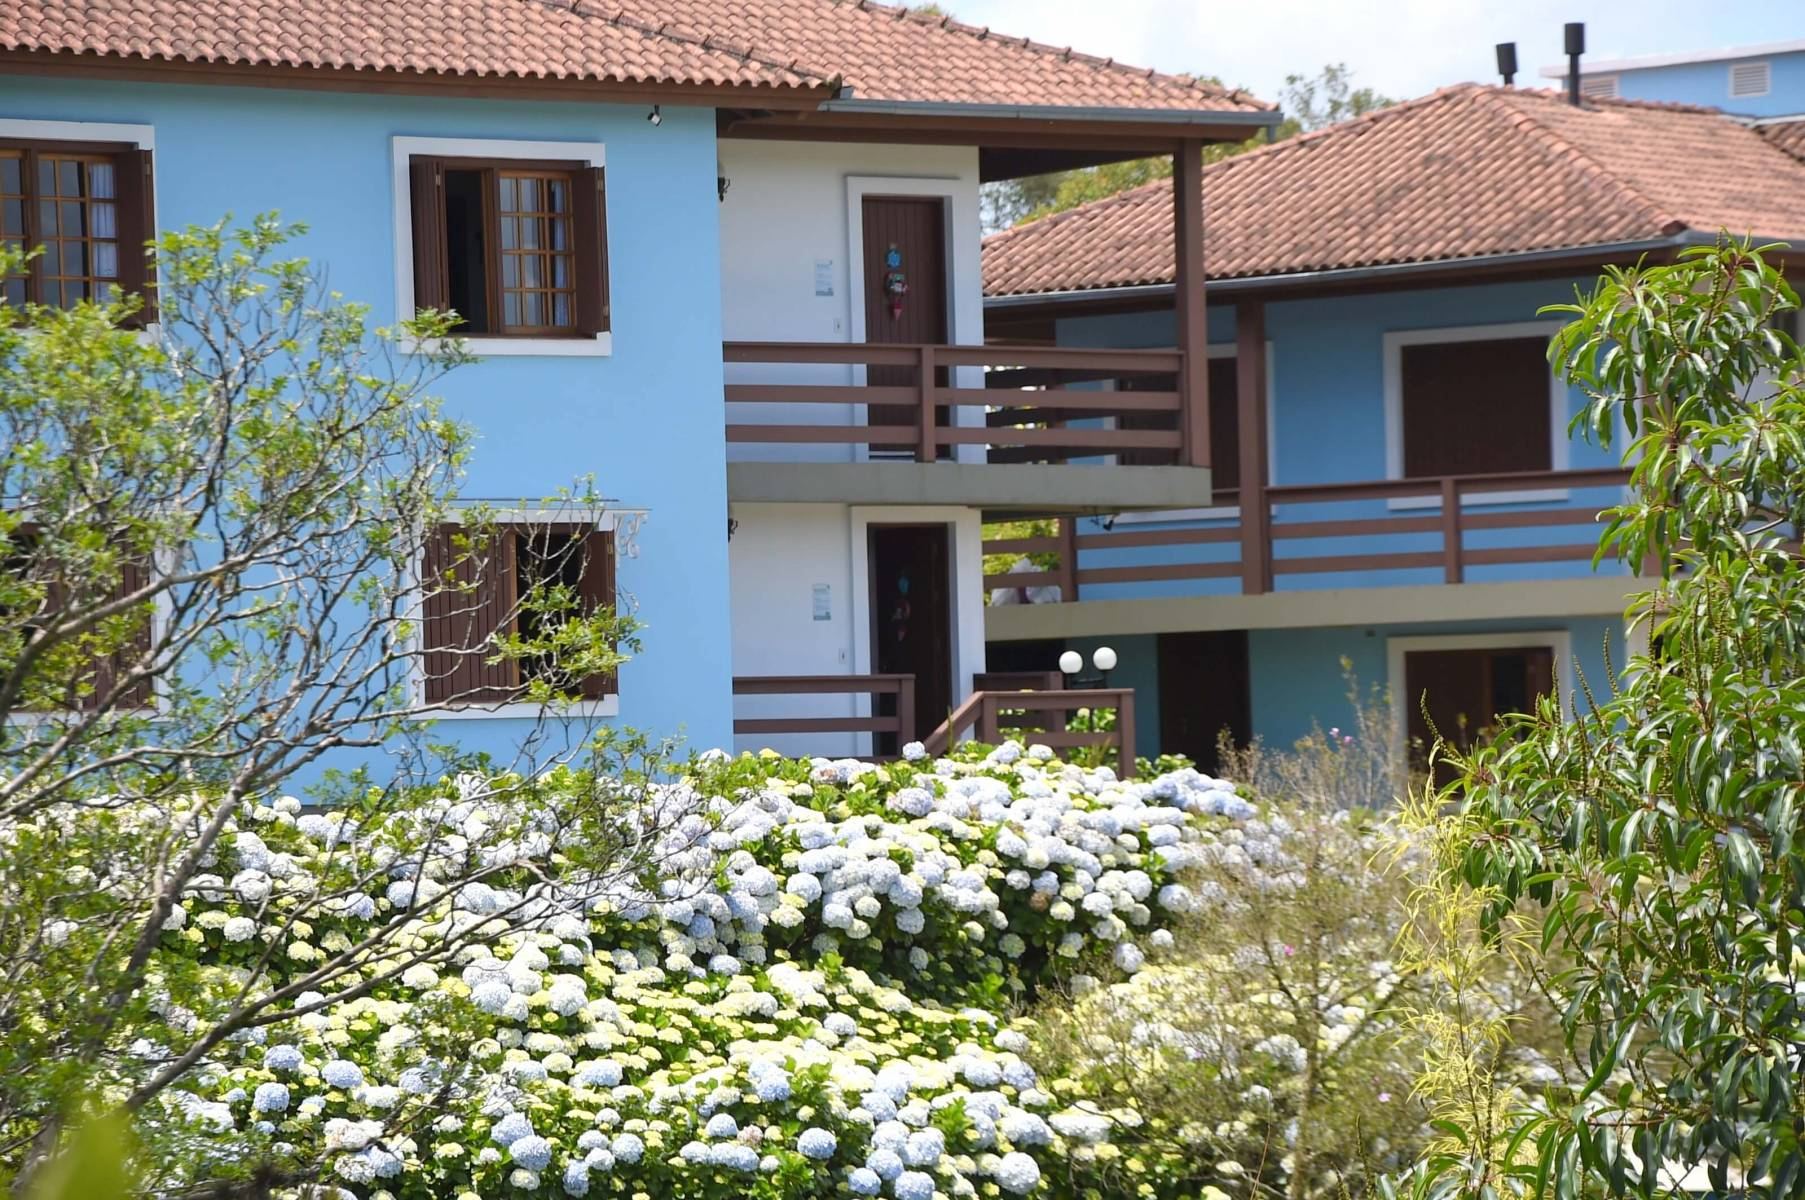 Bangalô Hortênsia - Hotel Bangalôs da Serra #CurtaSuaFamilia #HotelSustentavel #TurismoVerde #TravelersChoice #EcoLider #Gramado